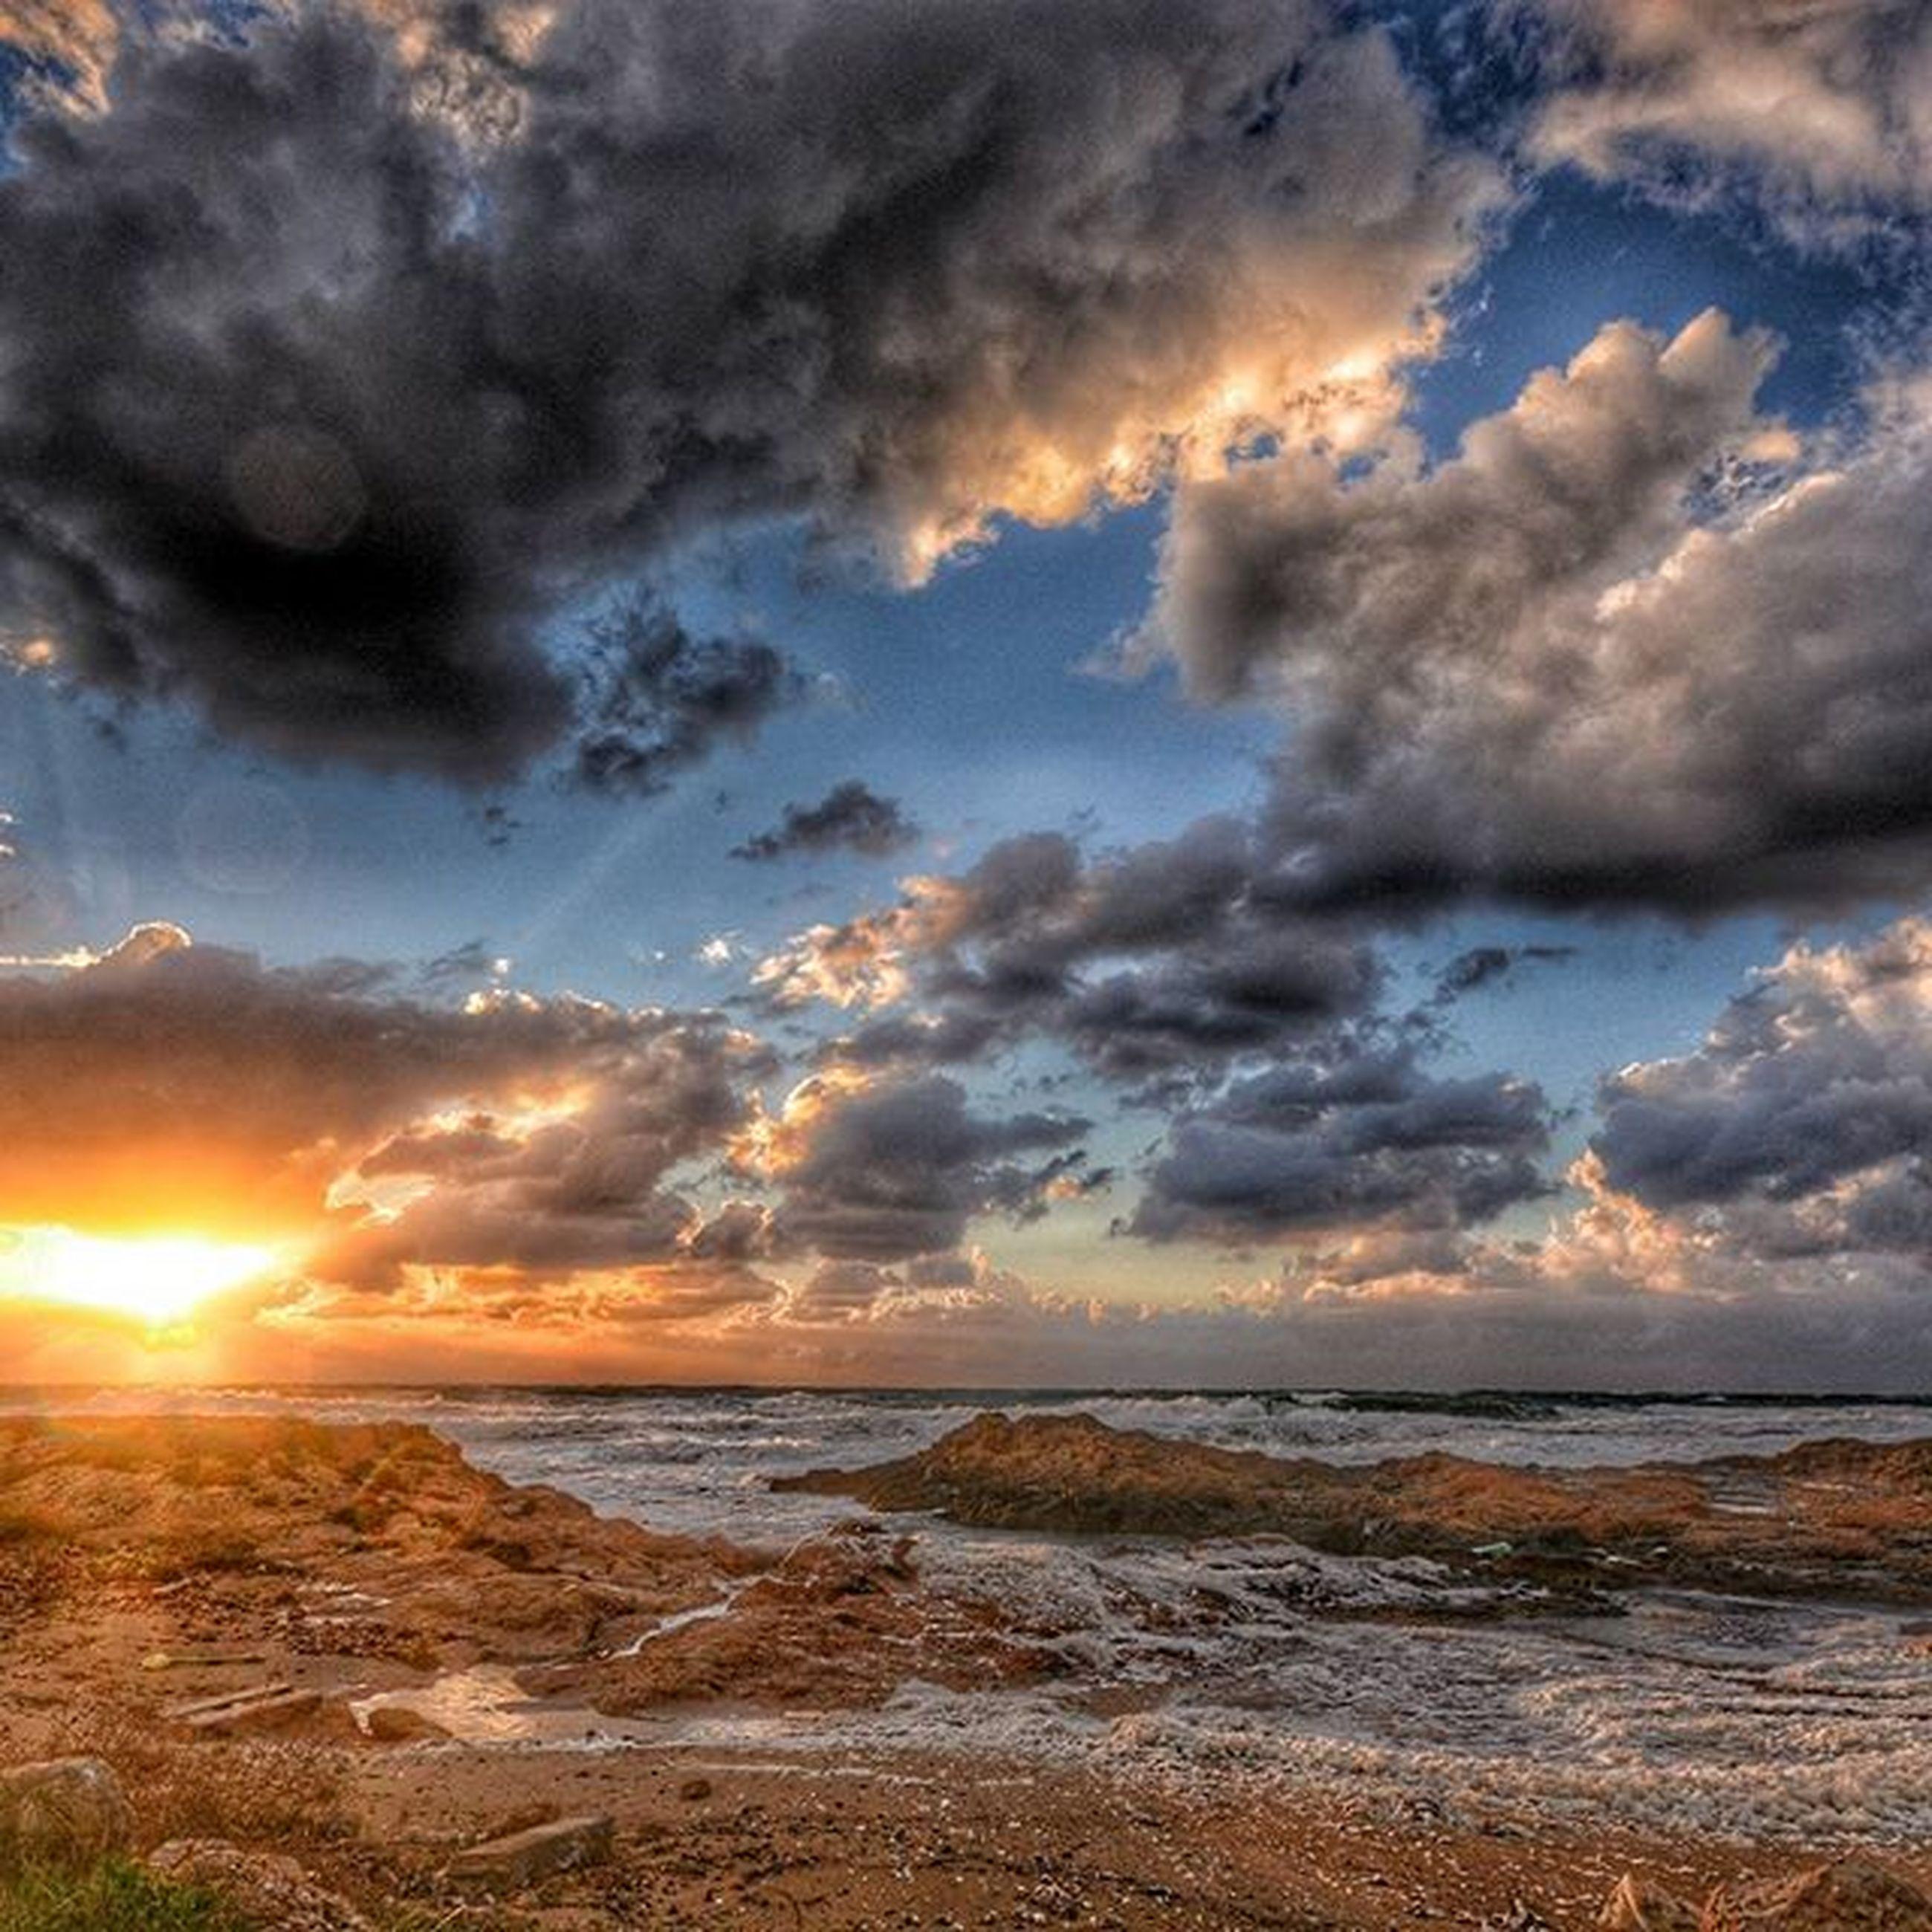 sky, sea, water, scenics, beach, cloud - sky, tranquil scene, horizon over water, beauty in nature, sunset, tranquility, shore, cloudy, nature, idyllic, cloud, sun, sunlight, sand, dramatic sky